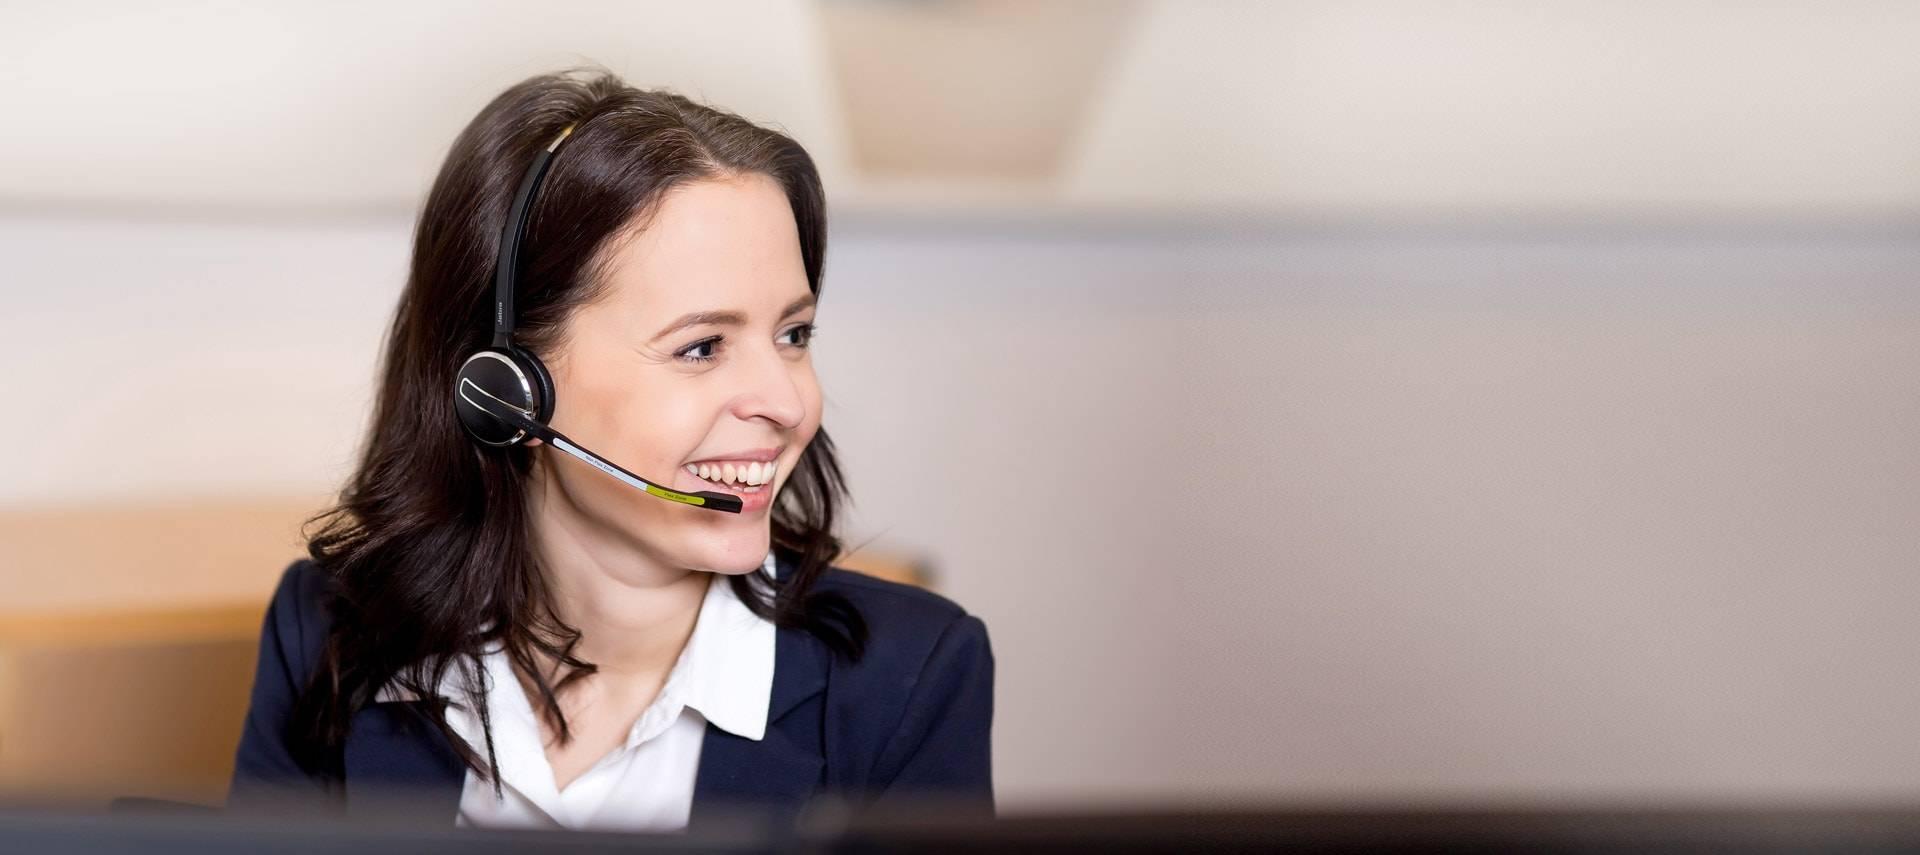 Om-topcall receptionist Maiken